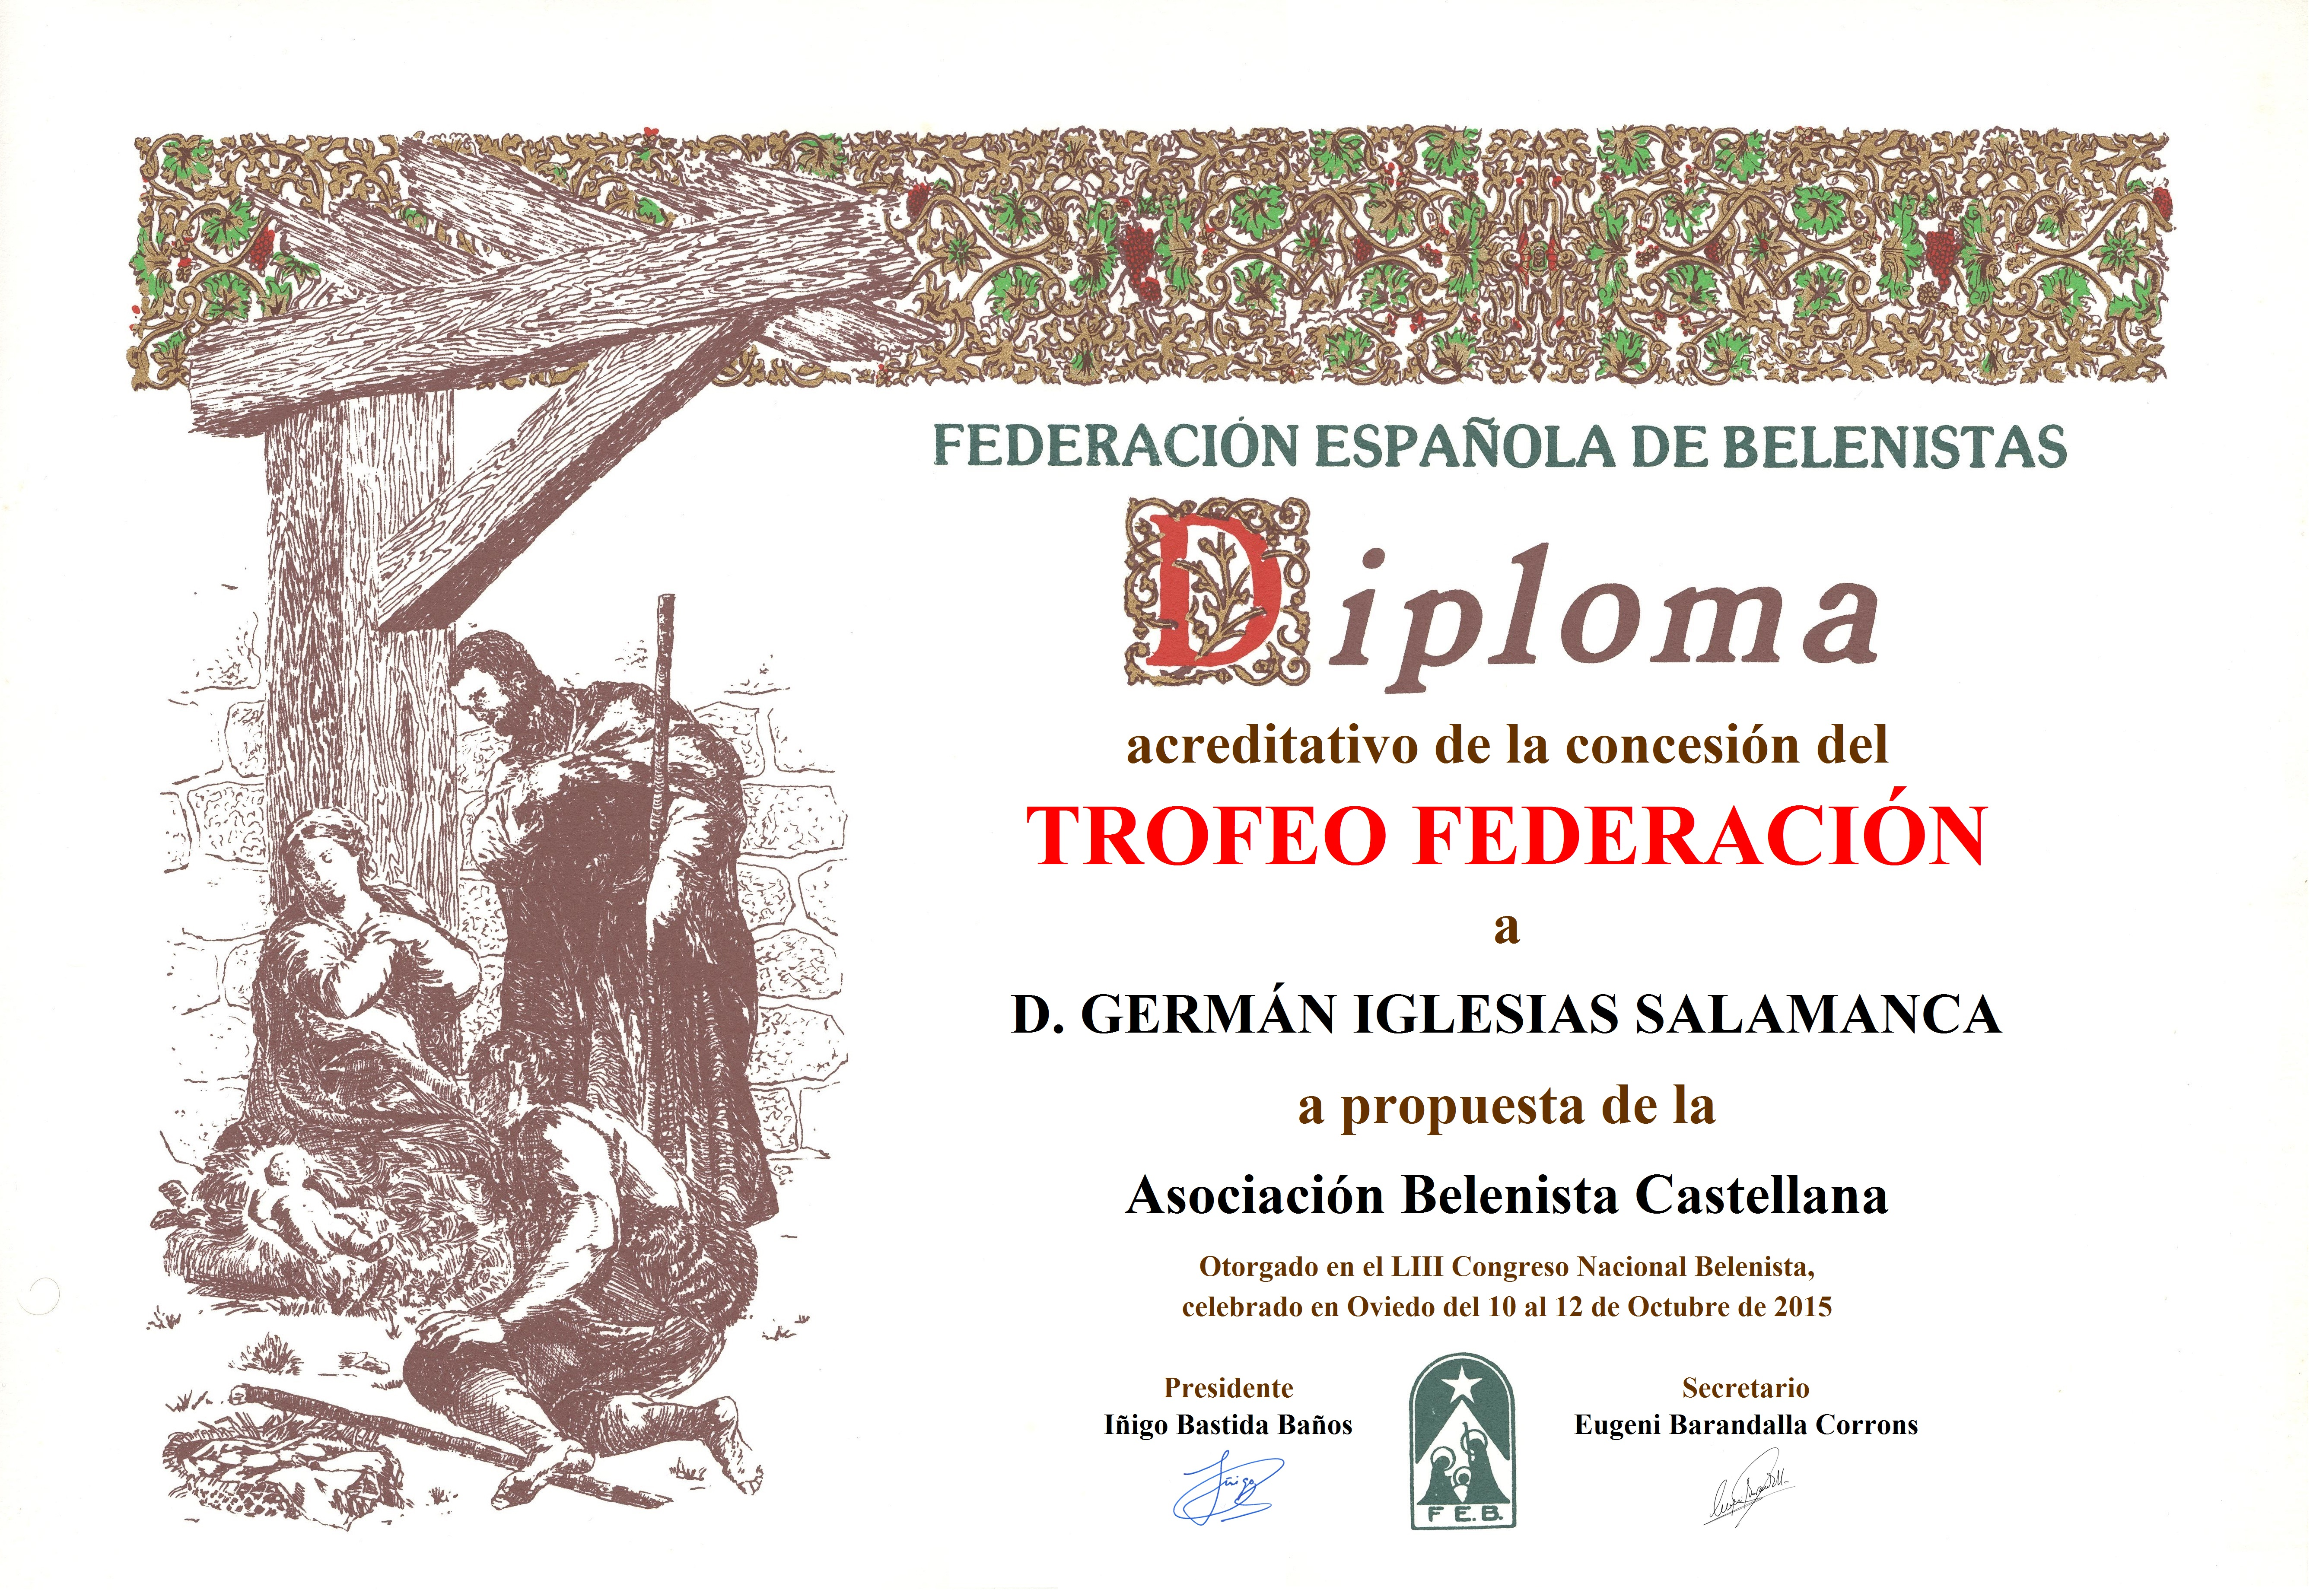 Diploma Trofeo FEB 2015 Germán Iglesias Salamanca